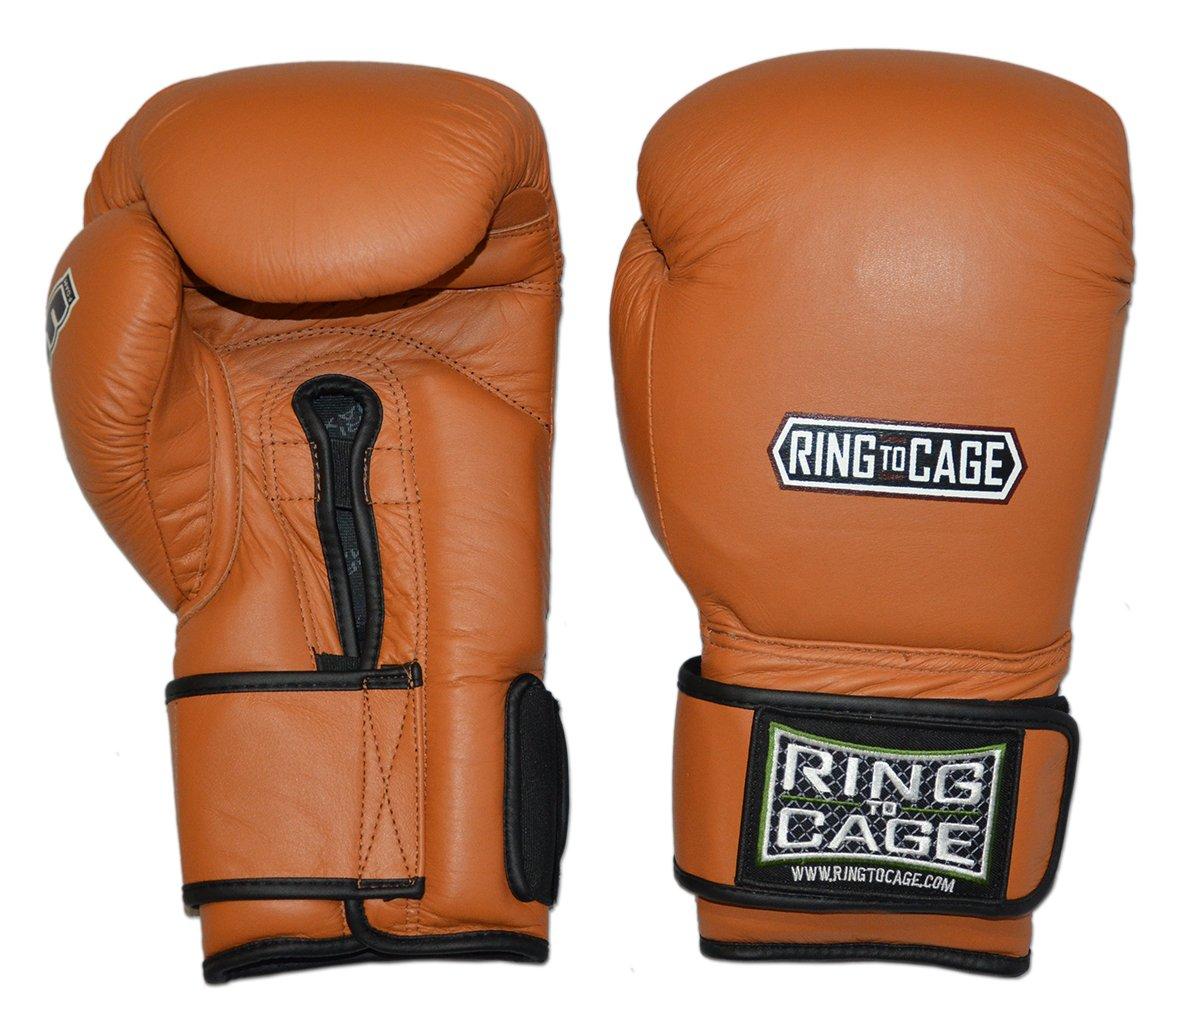 50ozデラックスmim-foam Sparring Gloves – Safetyストラップfor Muay Thai , MMA , Kickboxing、ボクシング( 50oz ) B01MF6924M Tan(brown)/Black